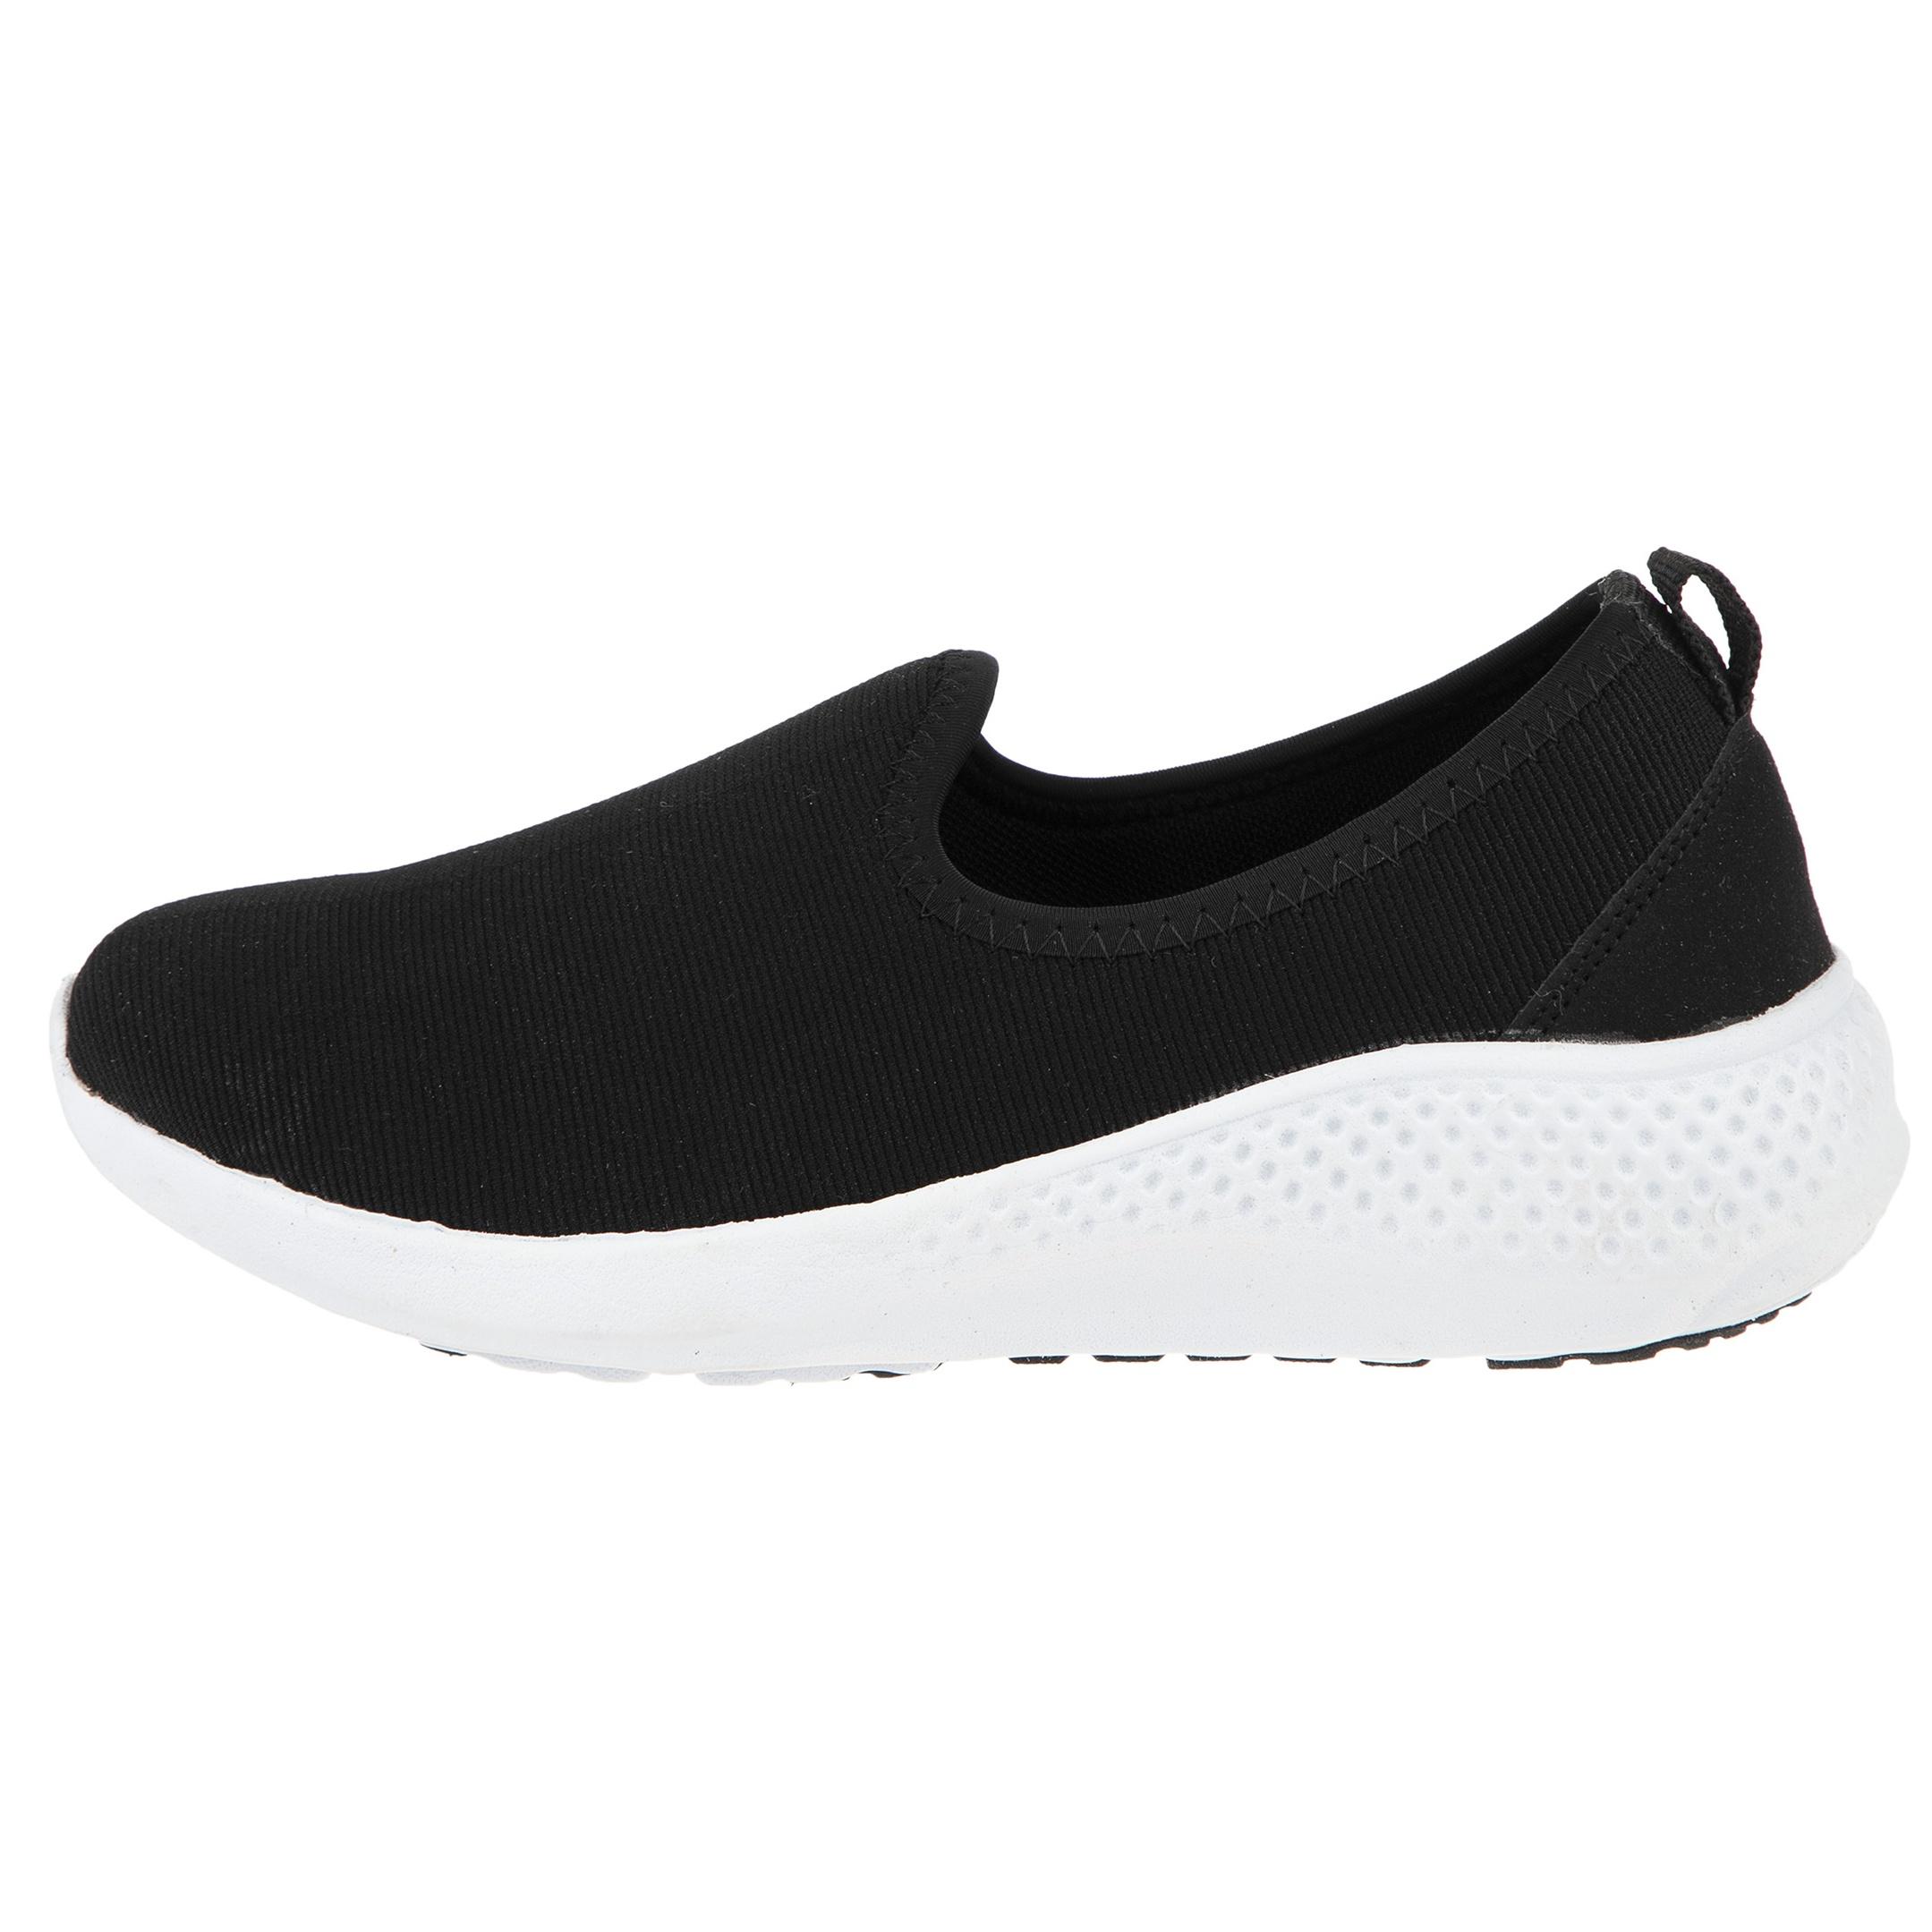 کفش روزمره زنانه نسیم k.026